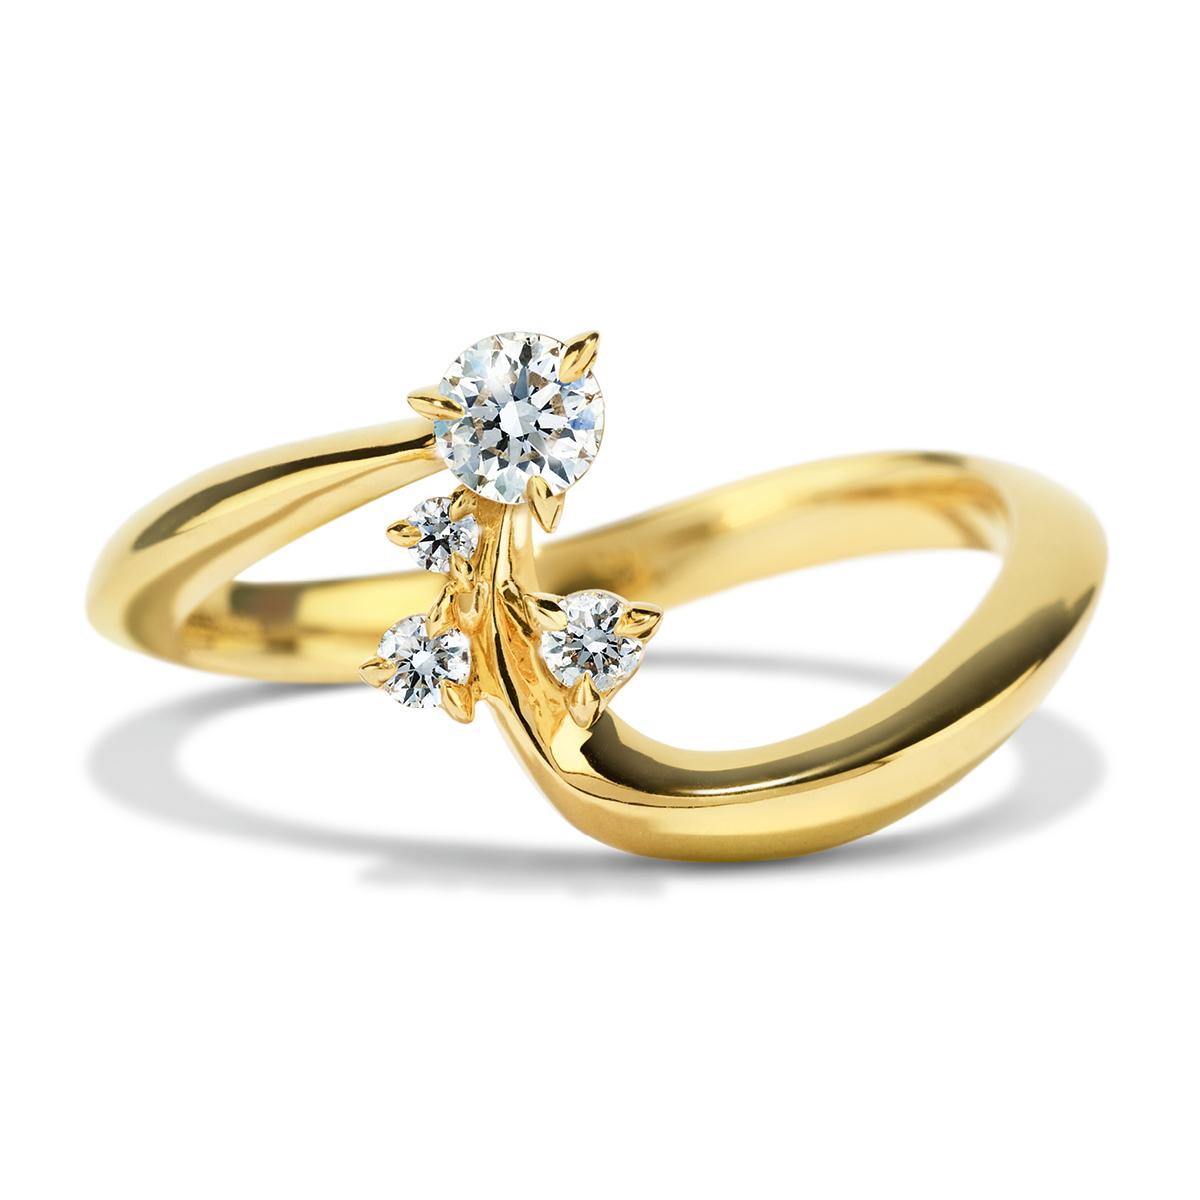 153169d9607f Atelier Swarovski Glacial Crescent Ring